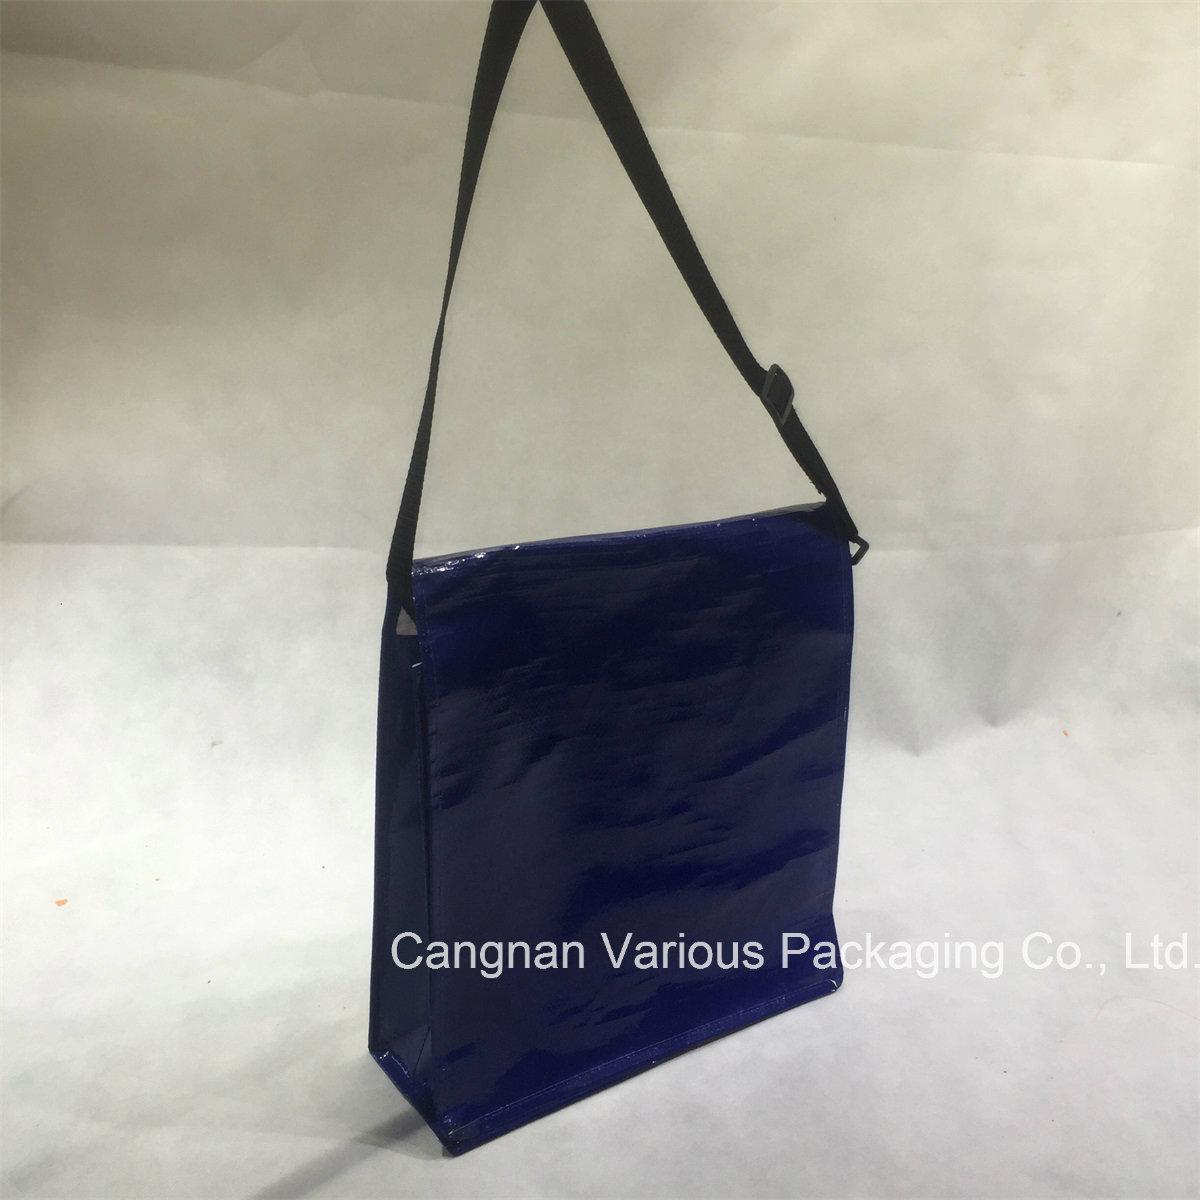 Custom Design PP Woven Tote Bag, Shoulder Bag